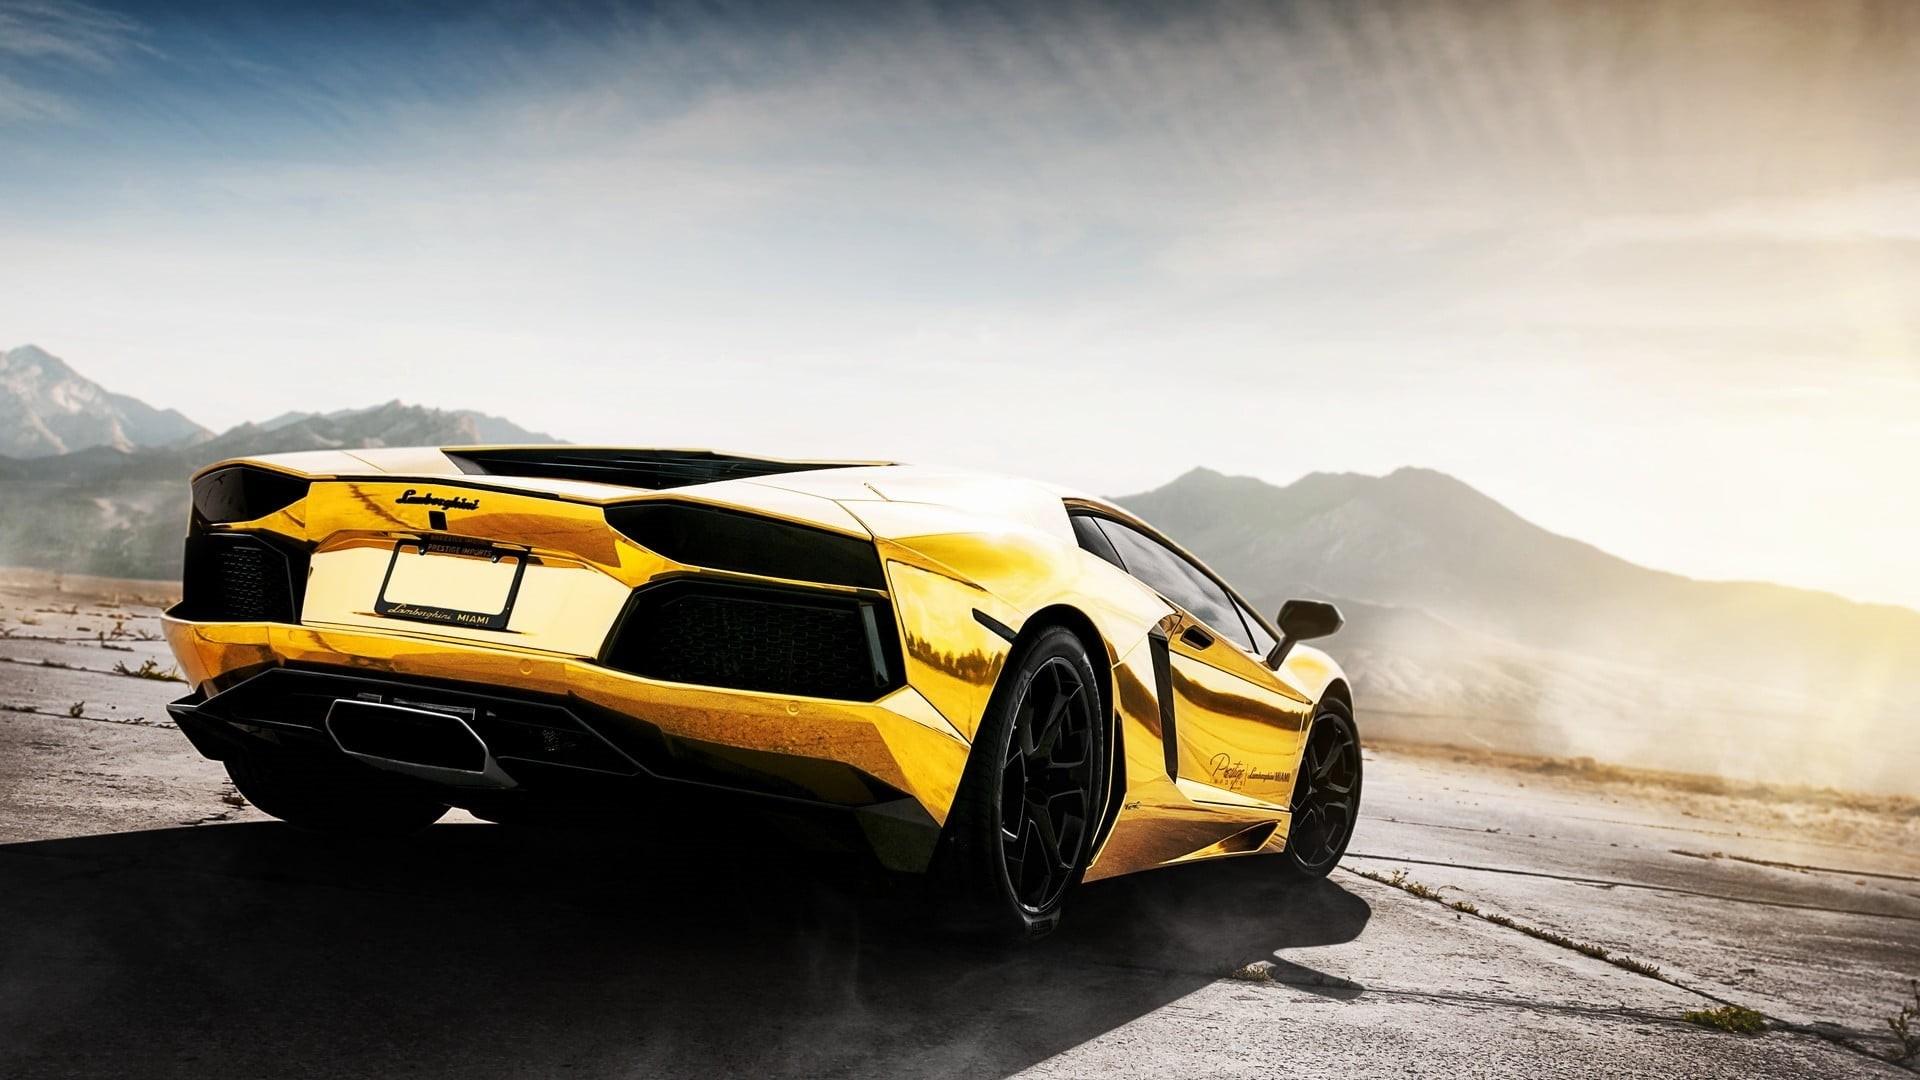 Gold Lamborghini PC Wallpaper